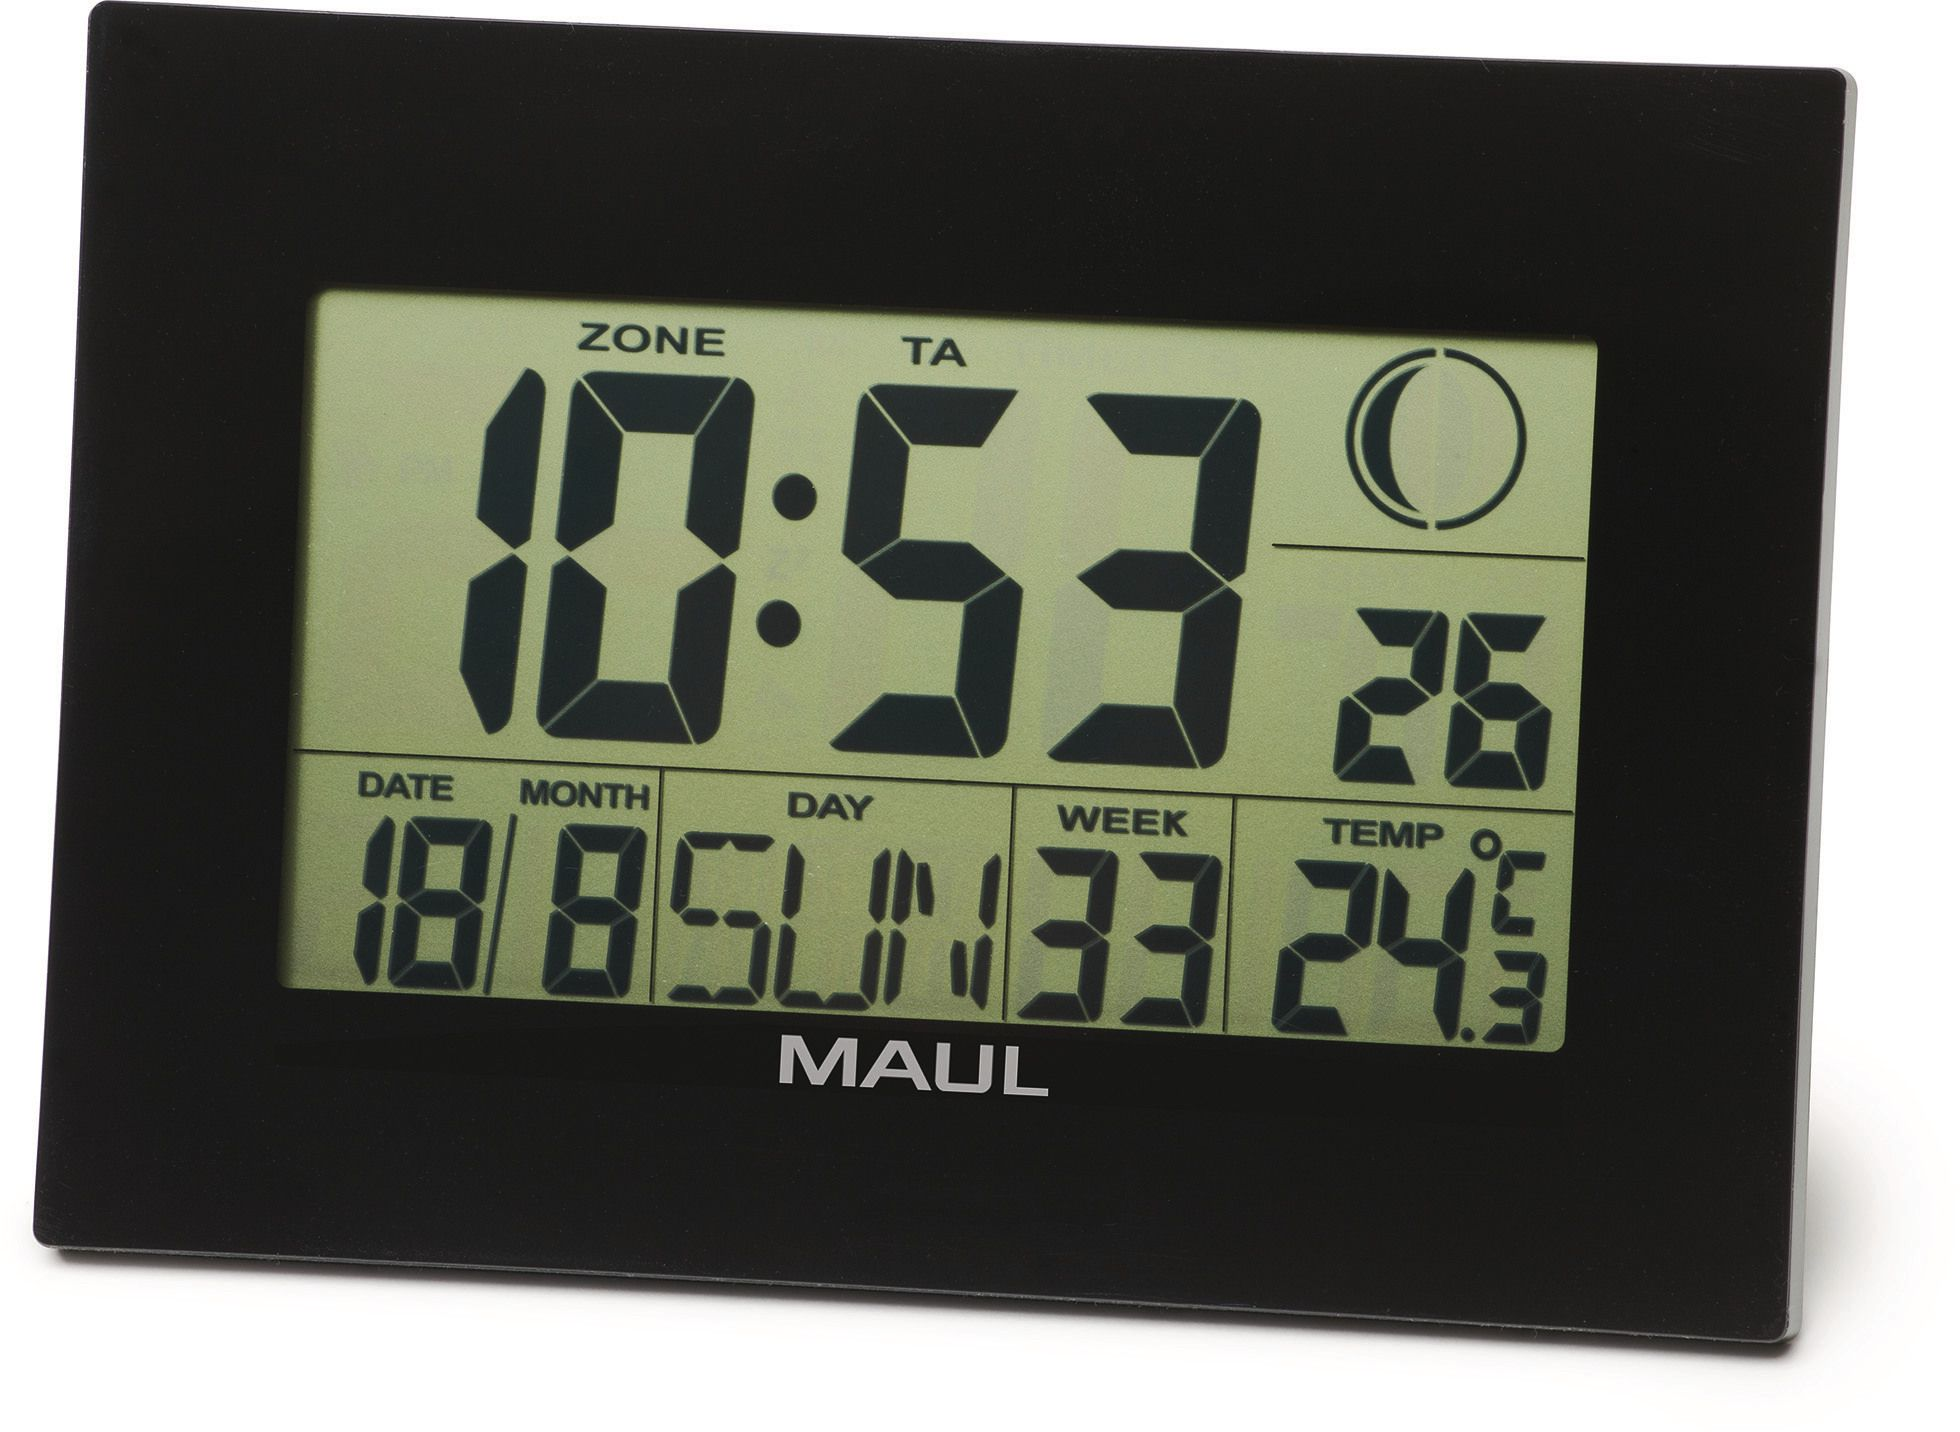 Horloge De Bureau Originale maul horloge murale maulflow 9082890 noir, digital - ecomedia ag